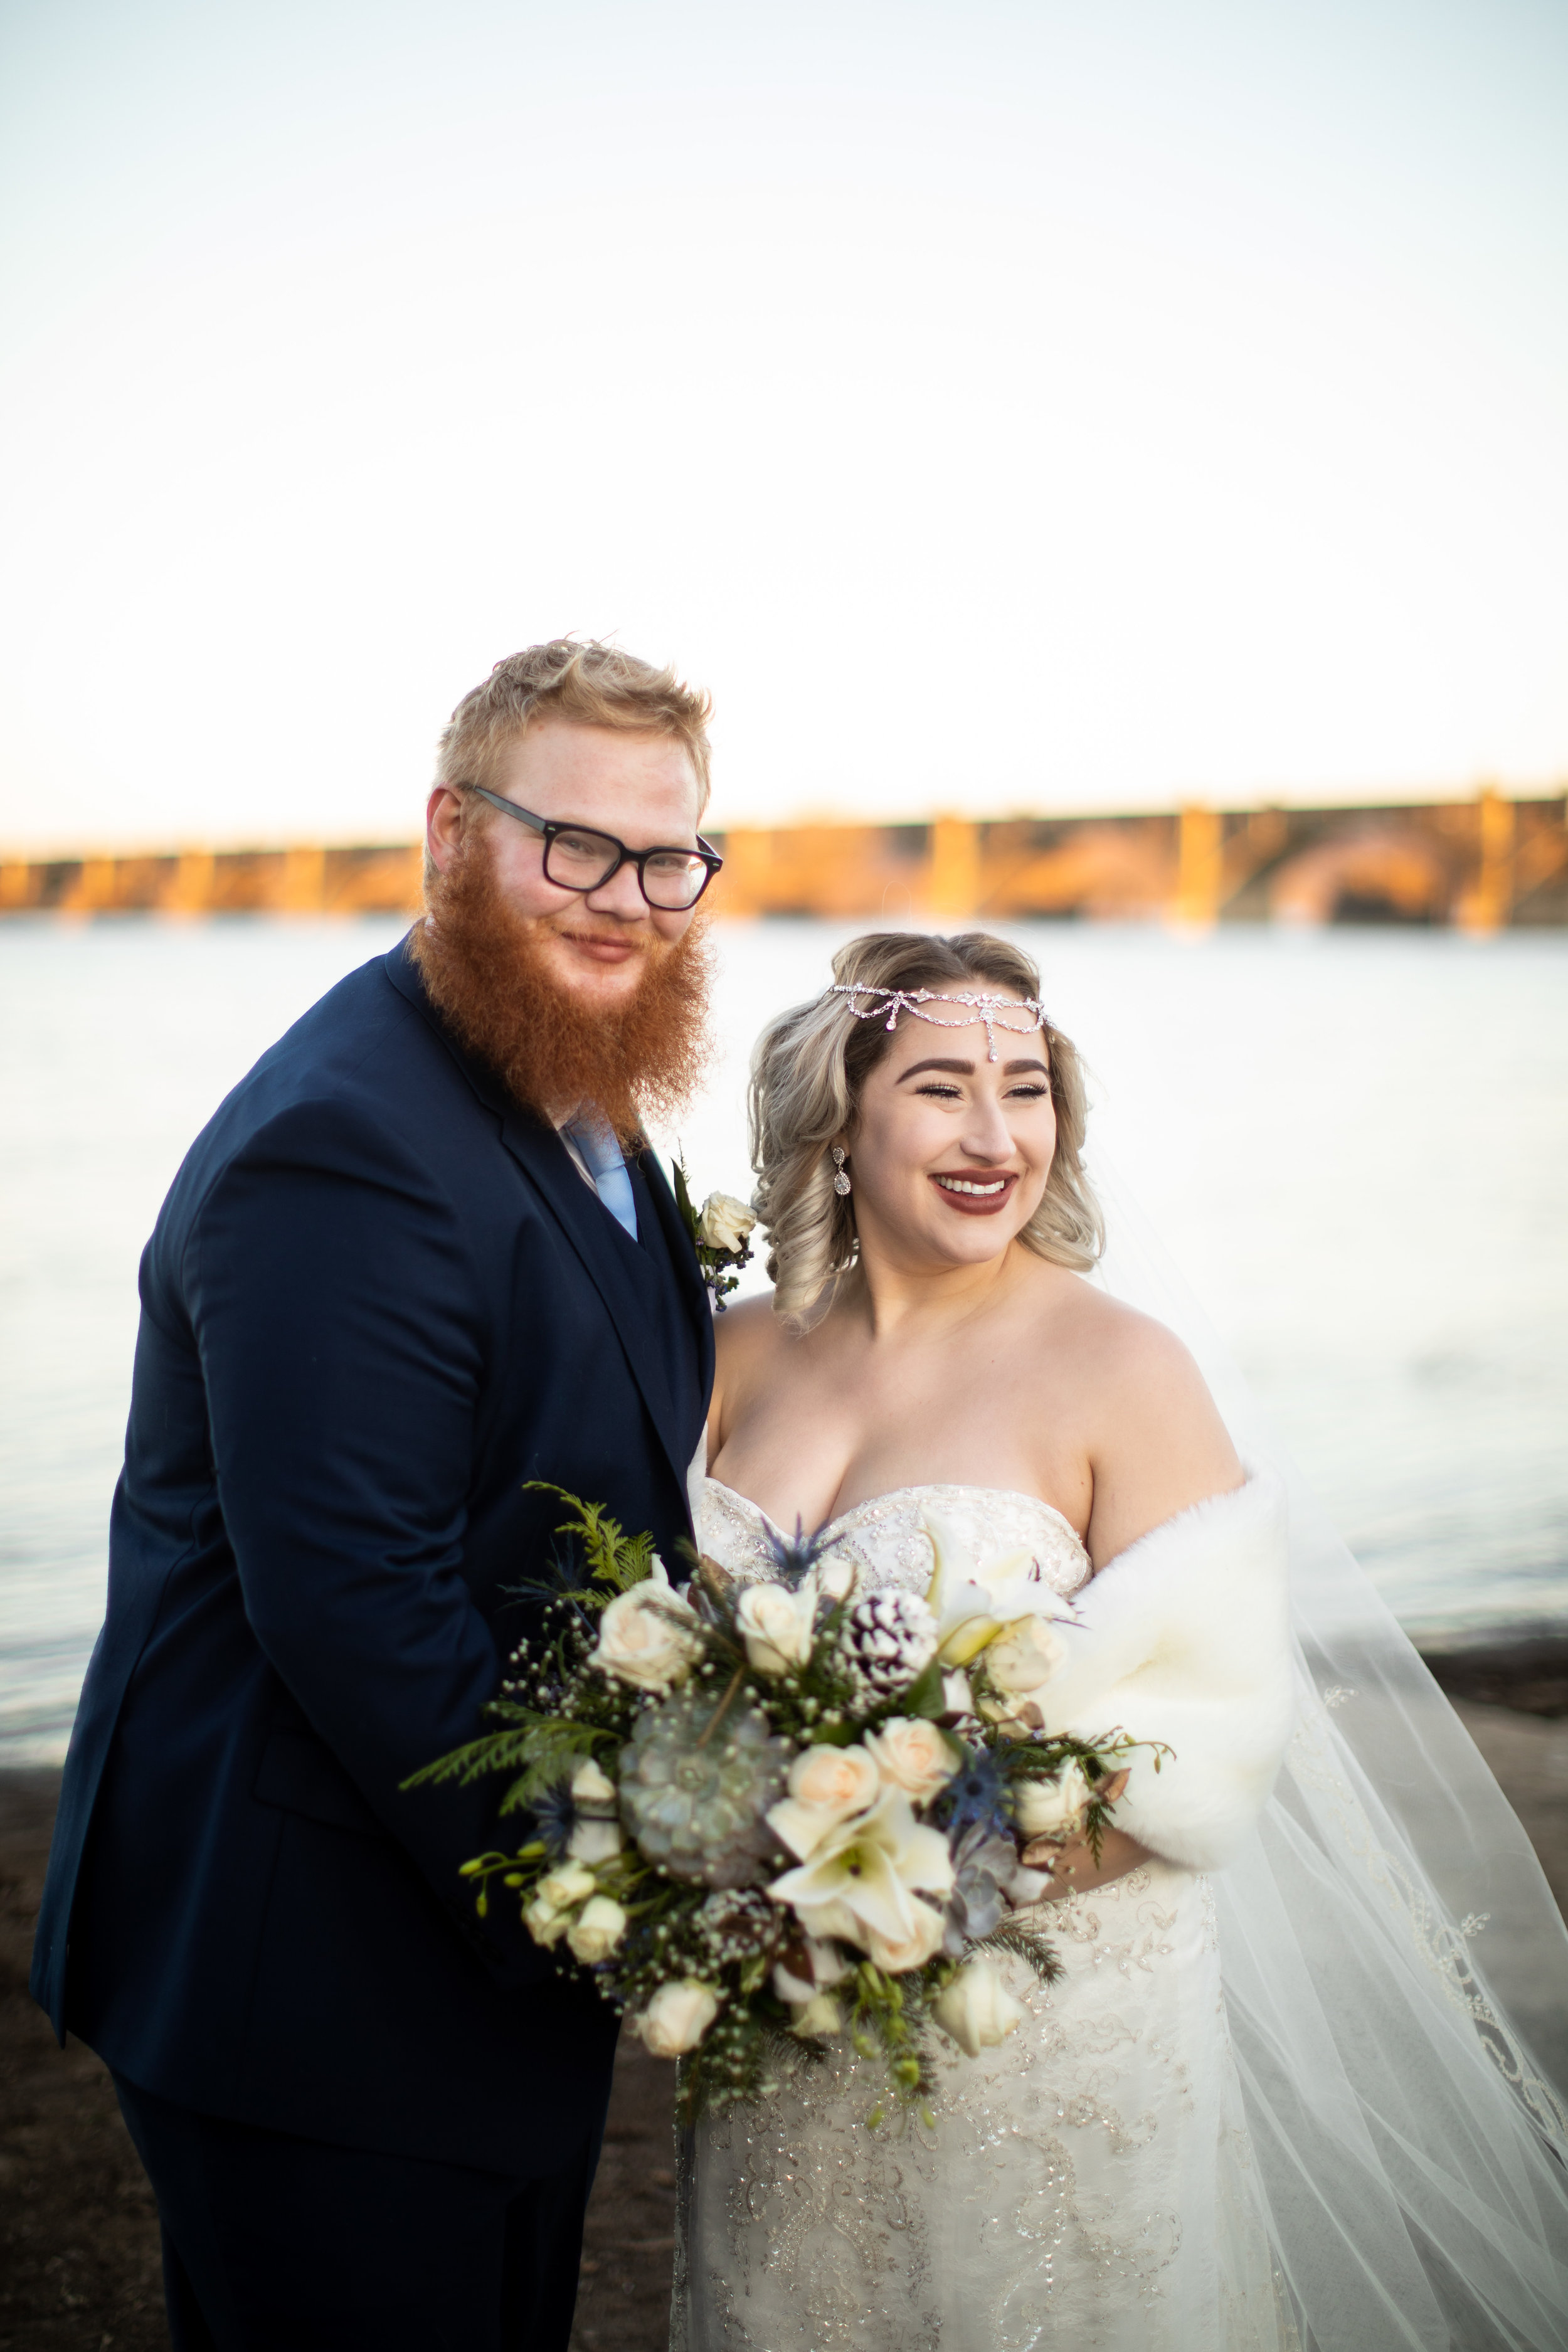 JESSICA+BJORN-WEDDING-658.jpg